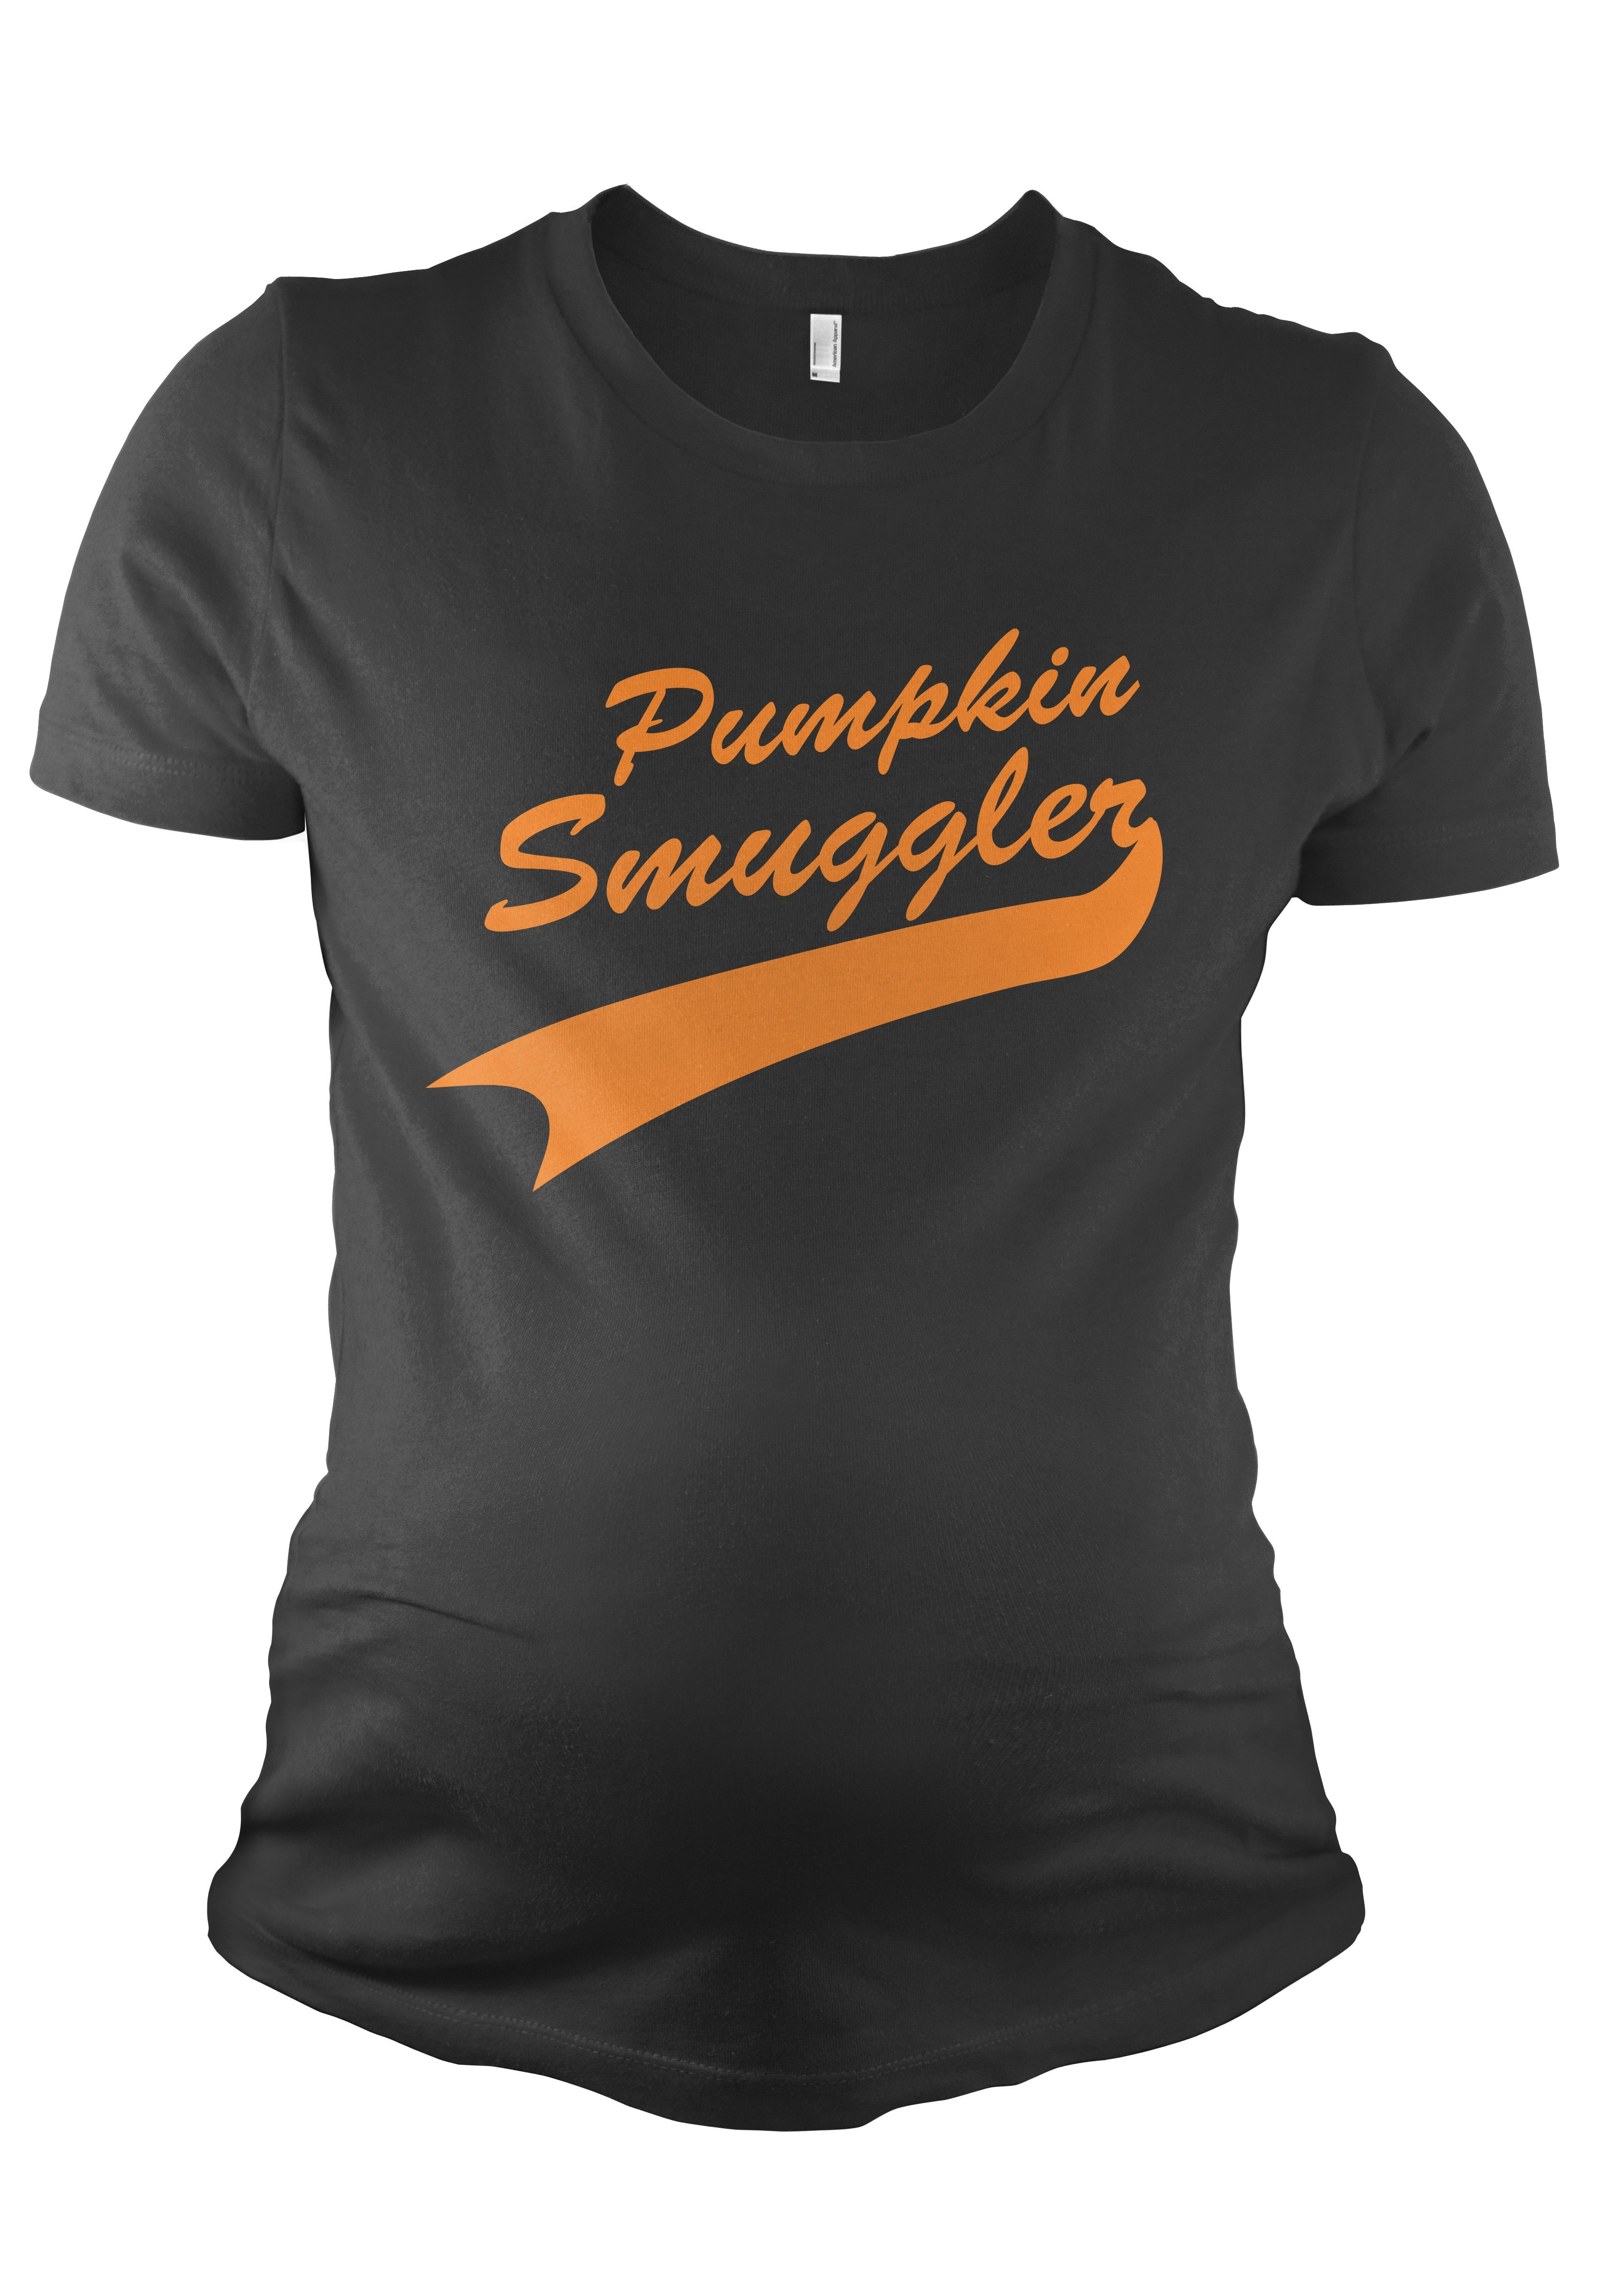 f0ce31b5 Pumpkin Smugger Maternity Shirt #MaternityShirt #Maternity #Baby #Fashion  #Funny #CrazyDogTShirts